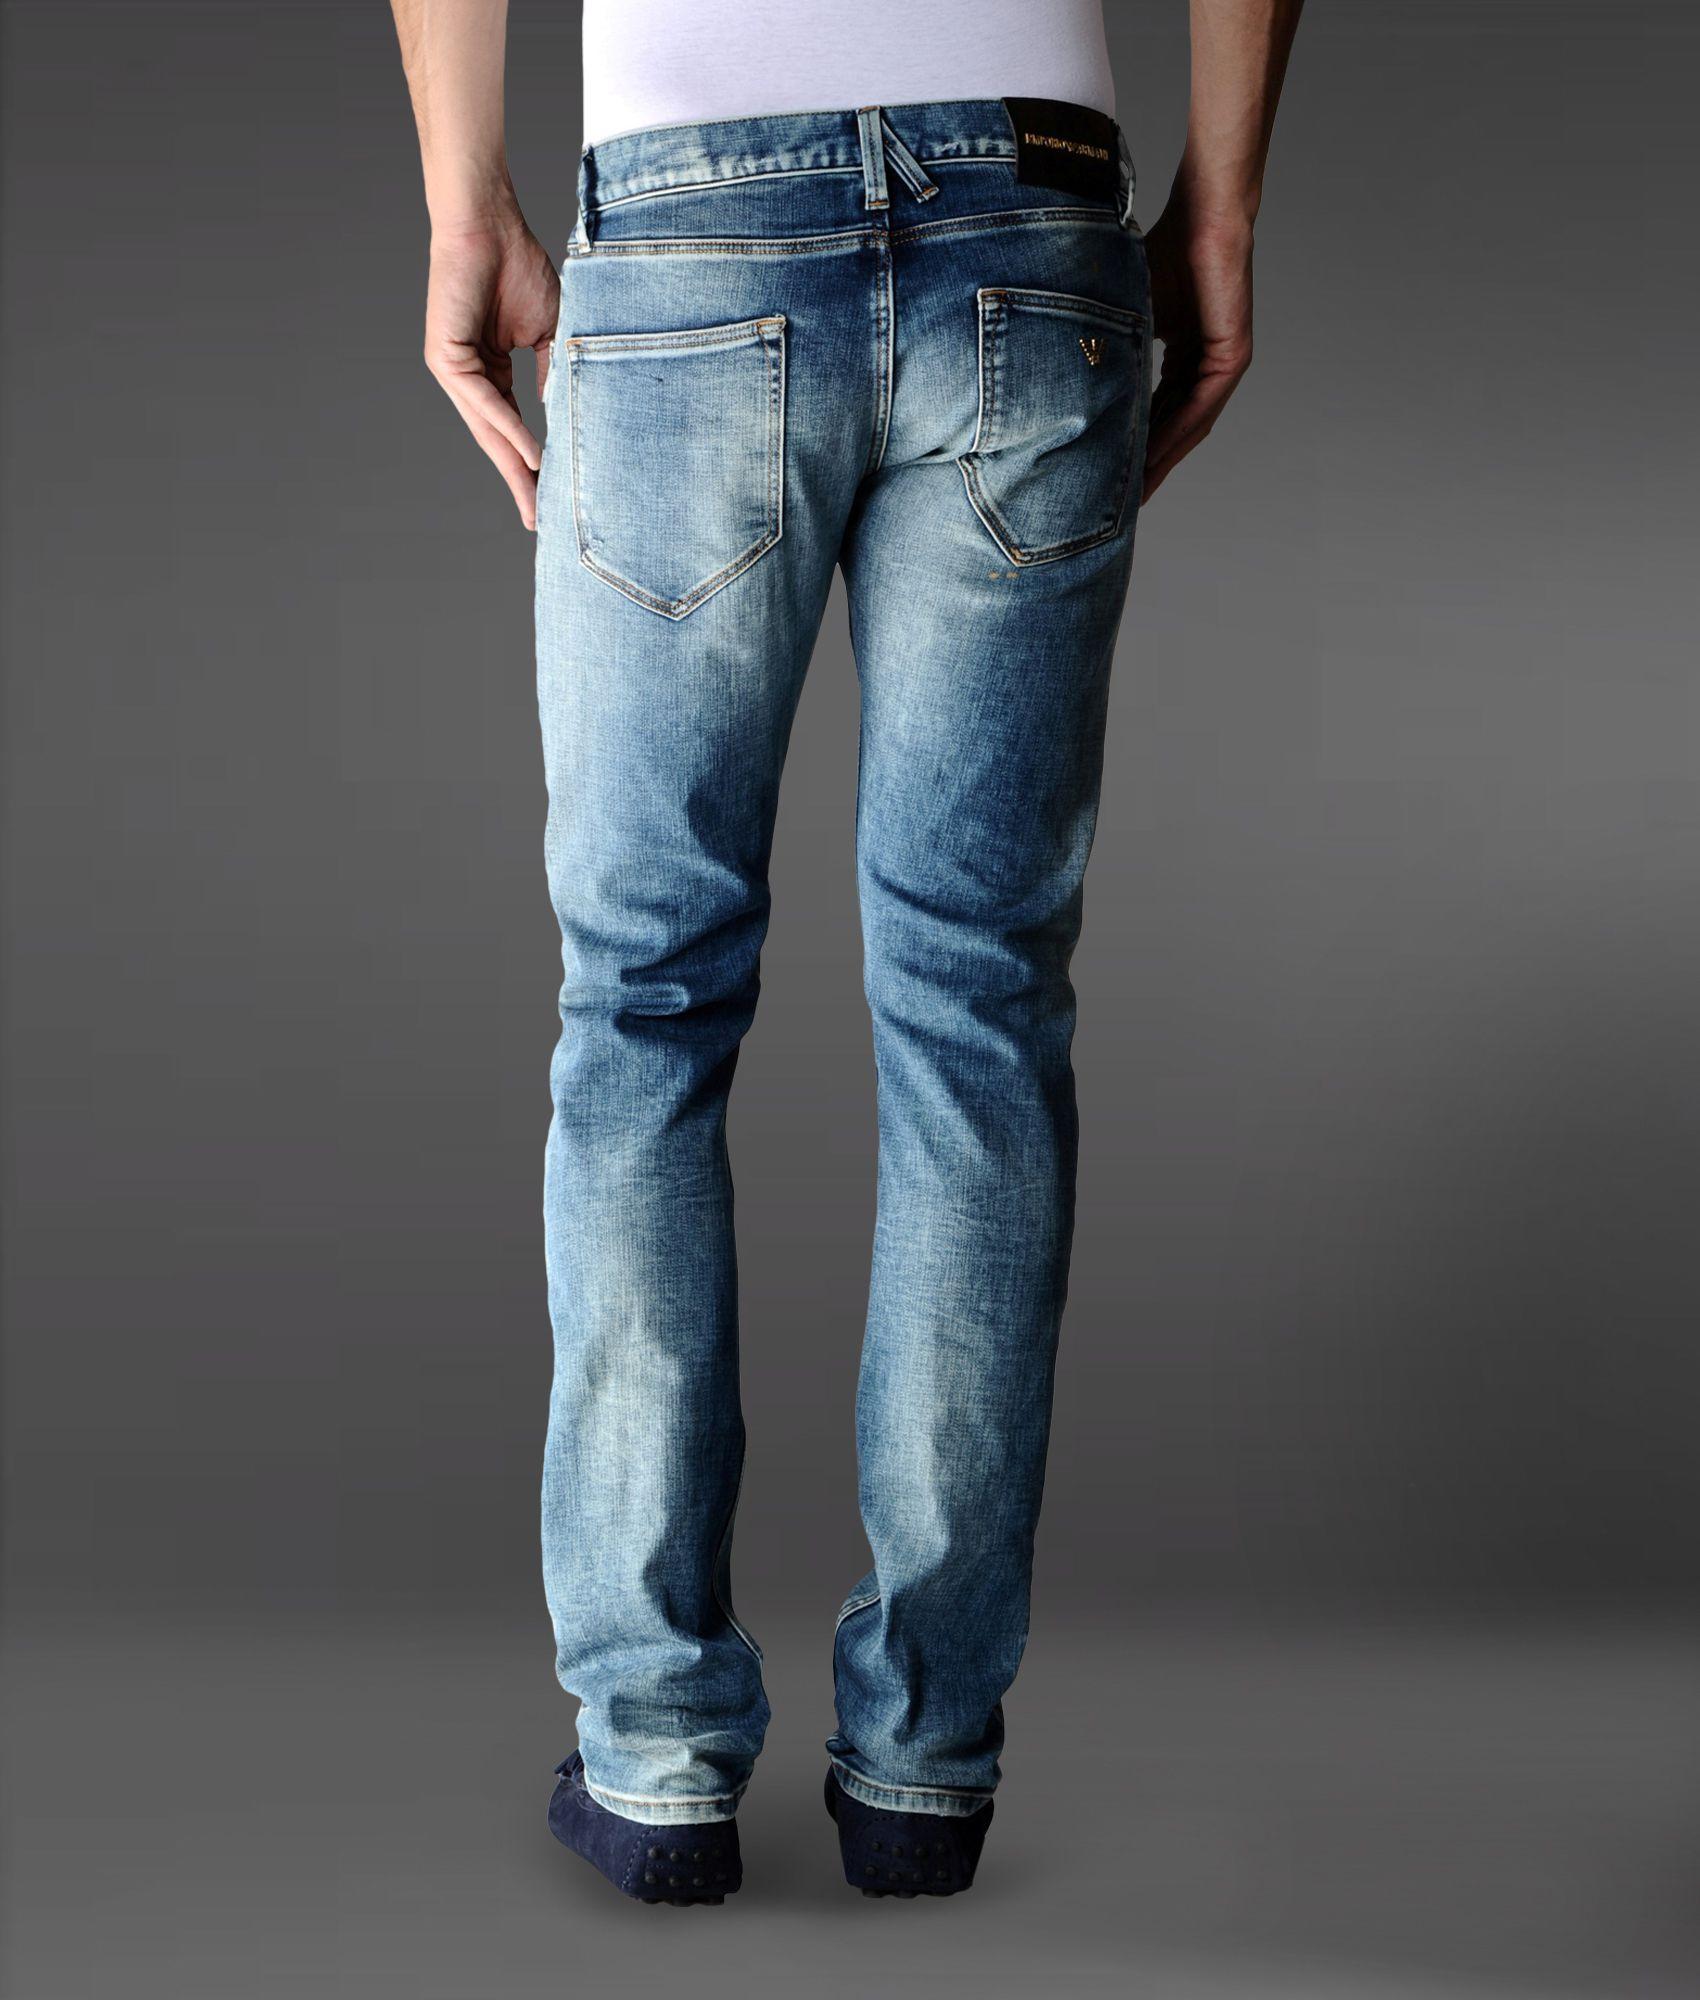 skinny fit jeans - Blue Emporio Armani Limited Outlet Online Shop Wholesale Price Sale Best Sale iiYdt